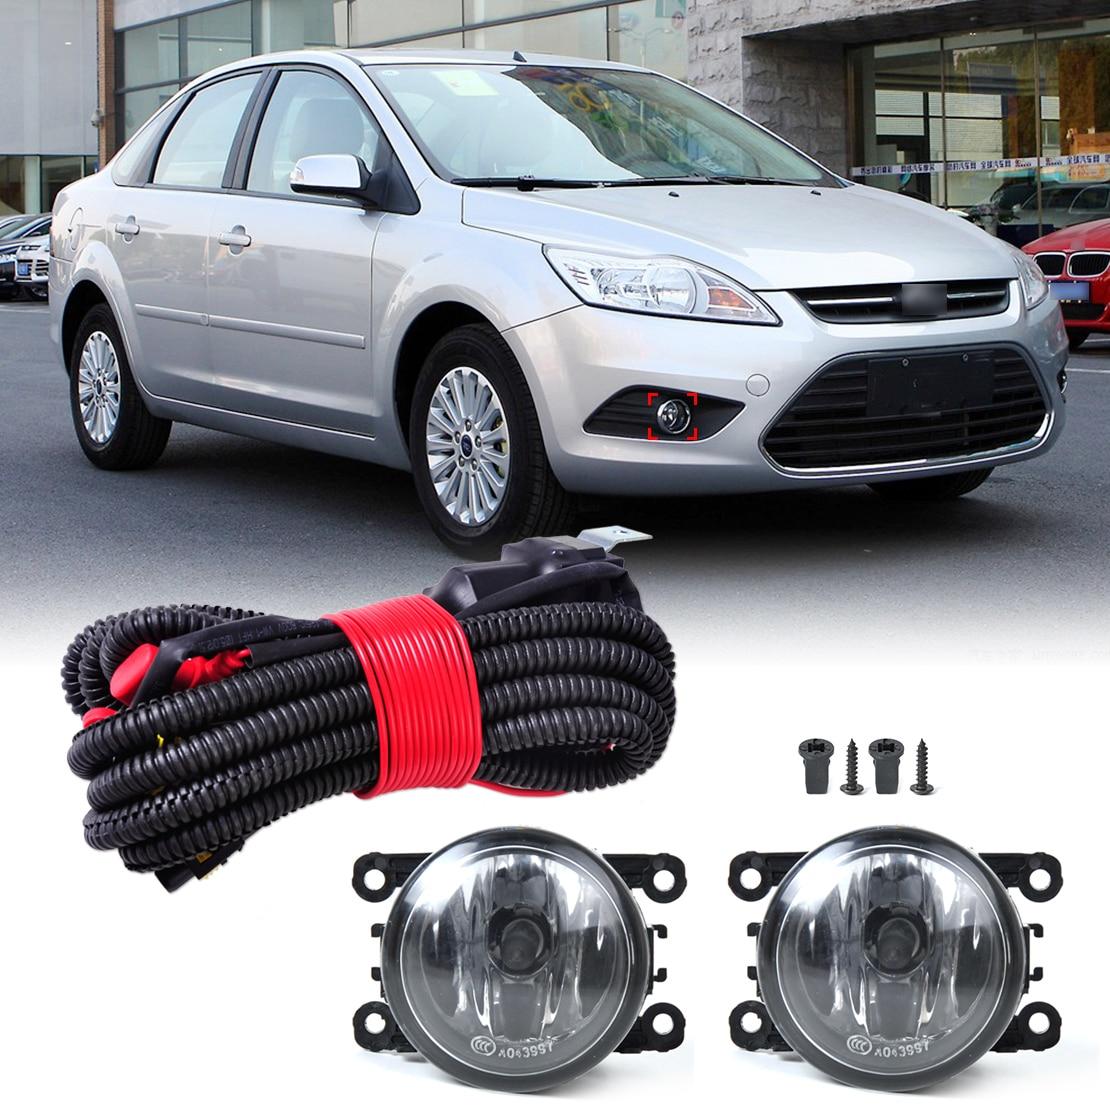 beler 1 Set H11 Wiring Harness Sockets Wire Connector + 2 Fog Lights Lamp for Ford Focus Honda CR-V Pilot Acura TSX Nissan